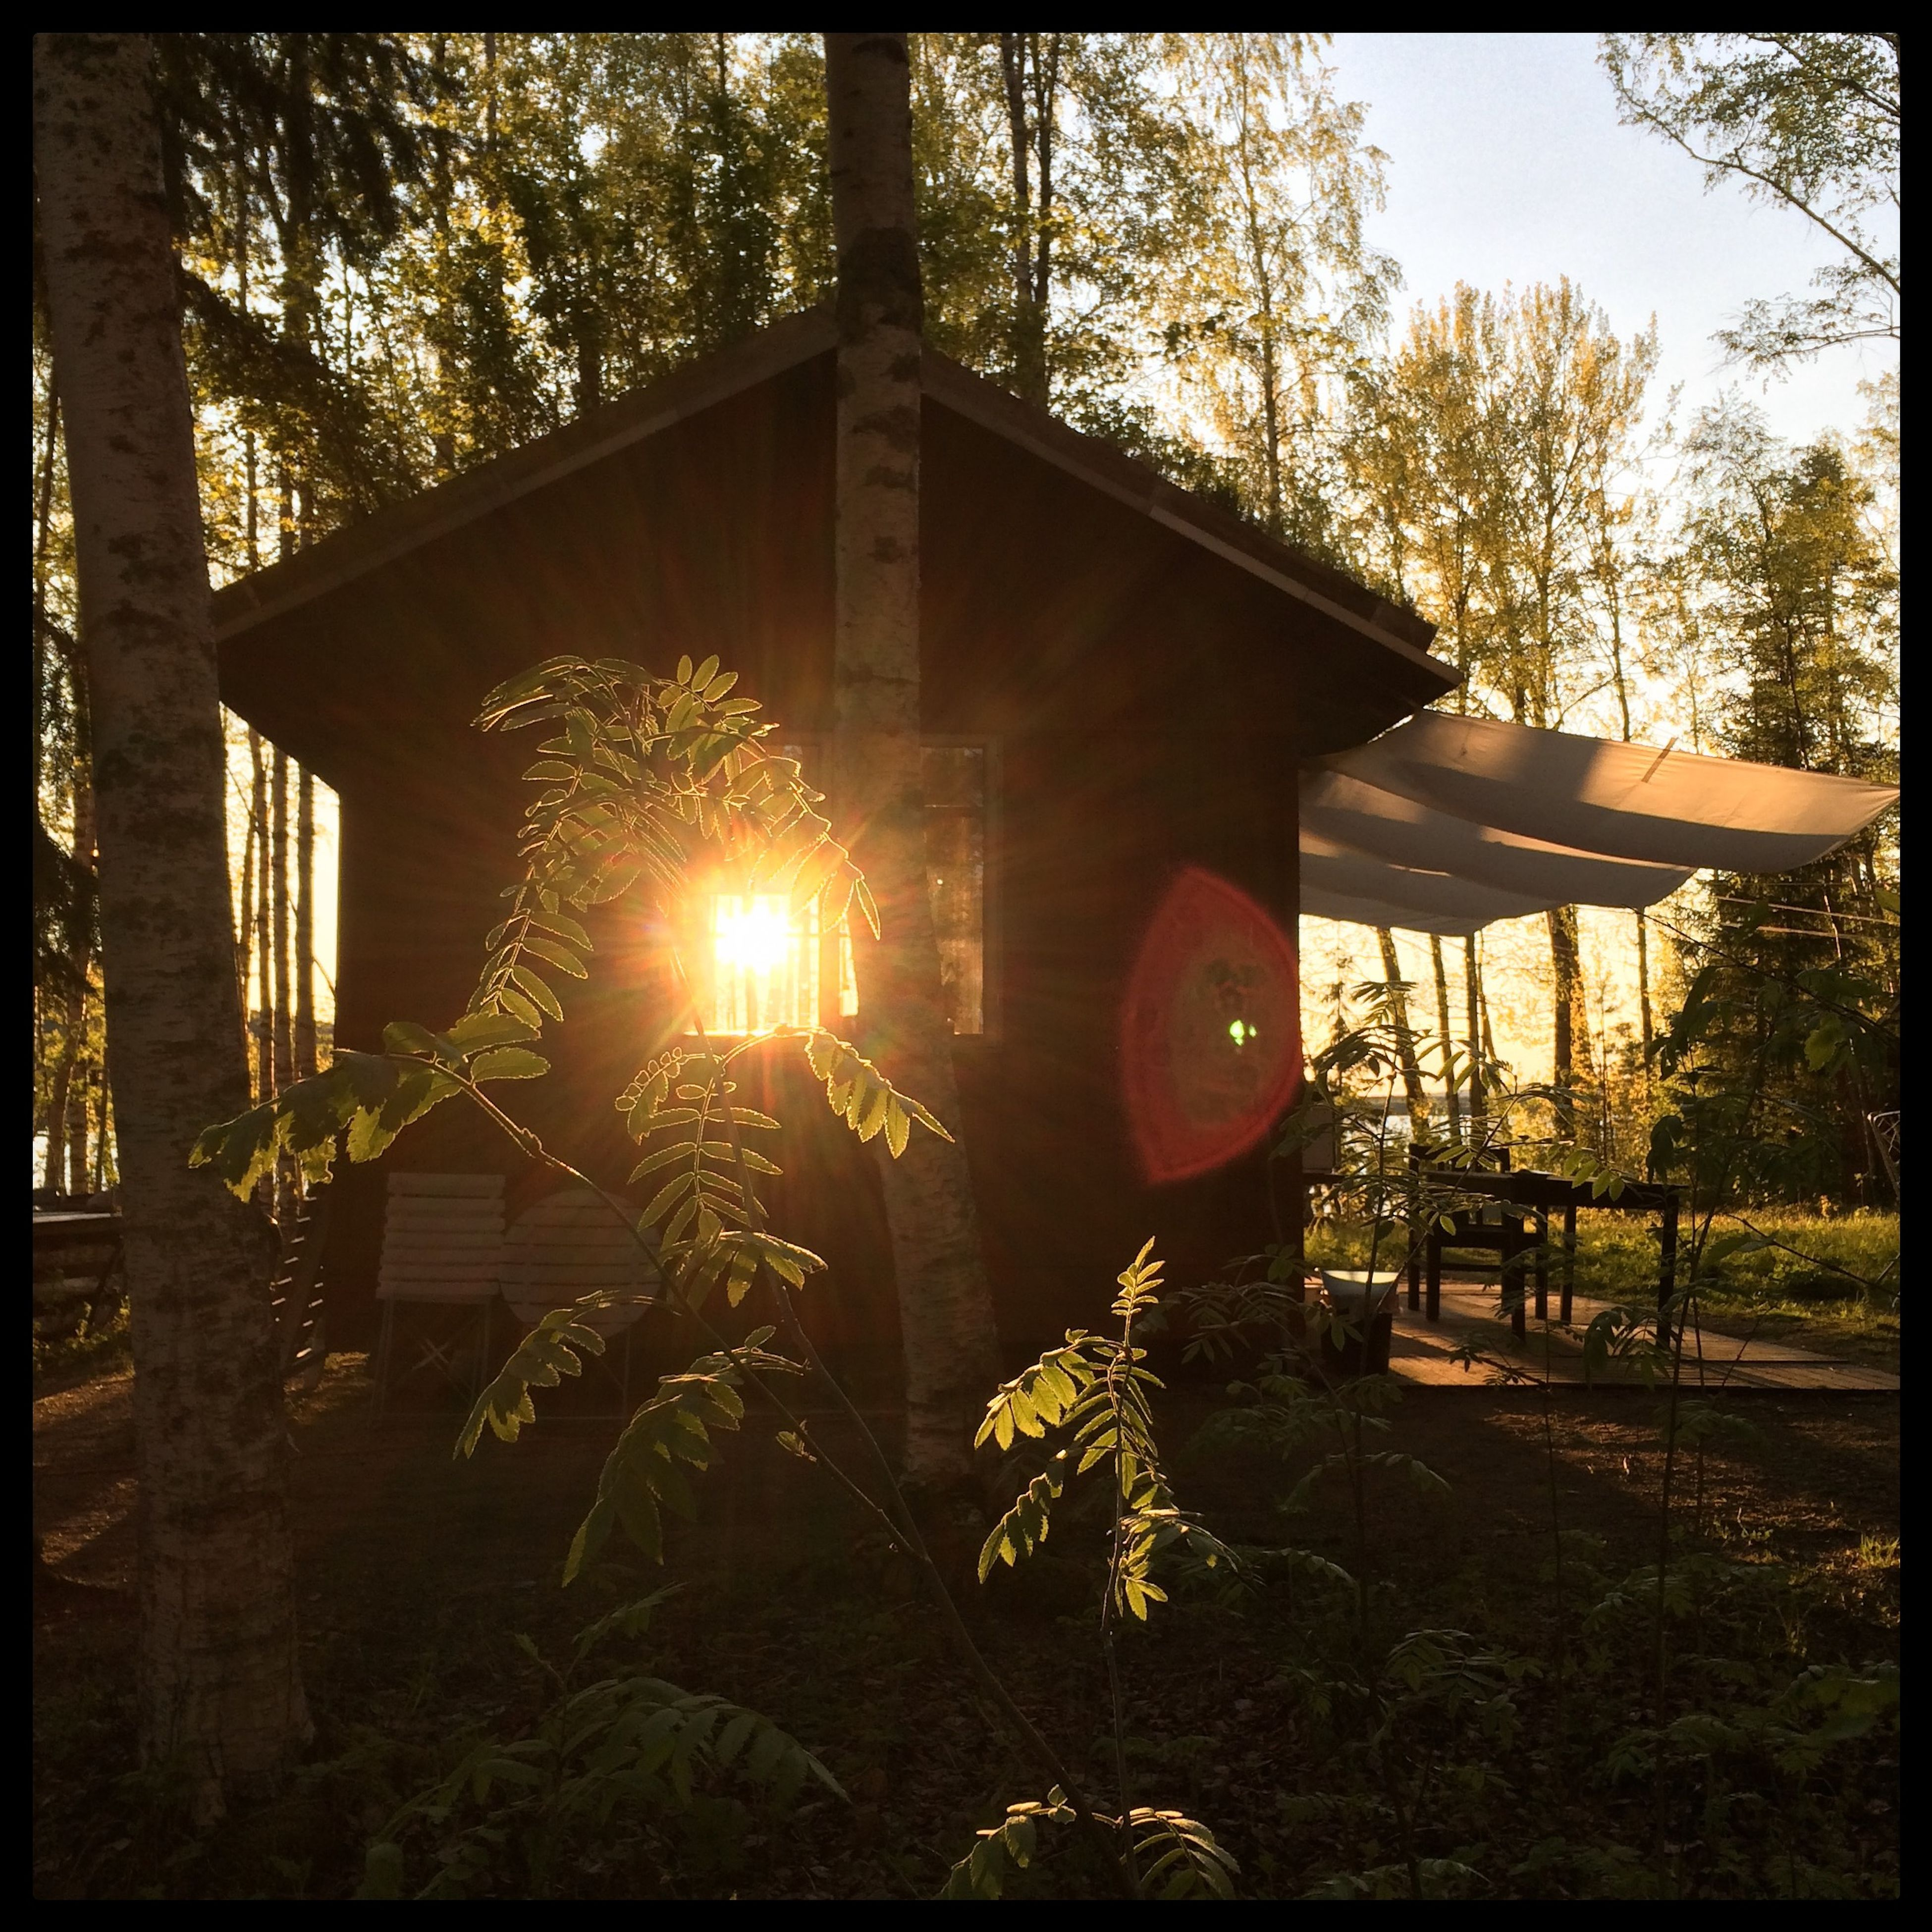 The cabin late last night. Today it's raining ... The Cabin Sunset Betarsjön Ångermanland Sweden Visitsweden Swedishmoments